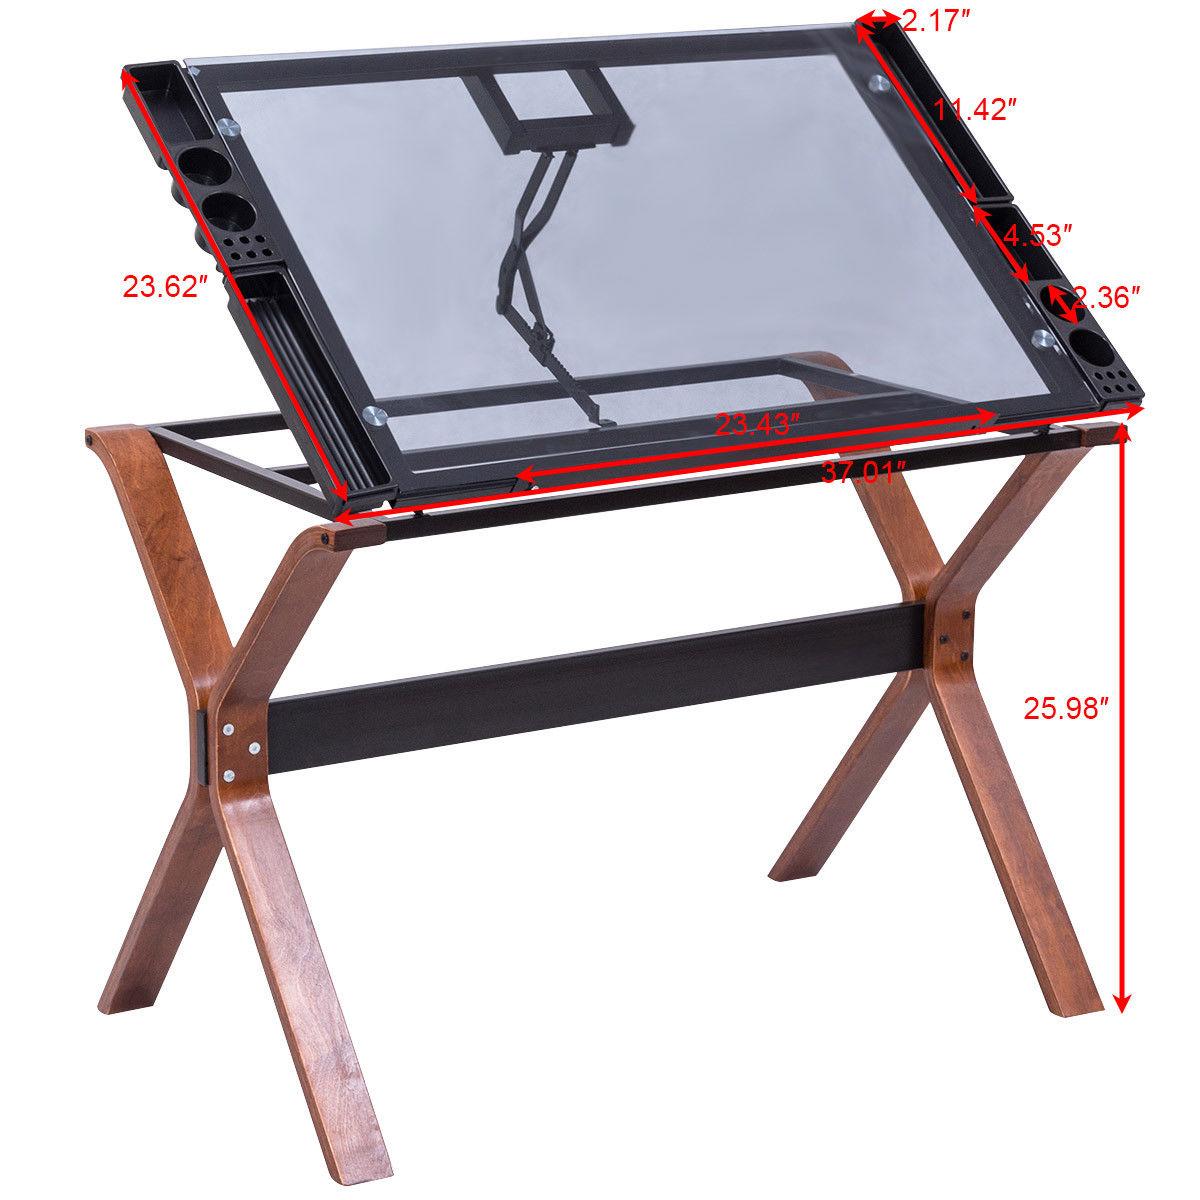 Charmant Giantex Adjustable Drafting Table Craft Station Modern Drawing Desk Glass  Top Art U0026 Craft Hobby Furniture HW56042 In Laptop Desks From Furniture On  ...